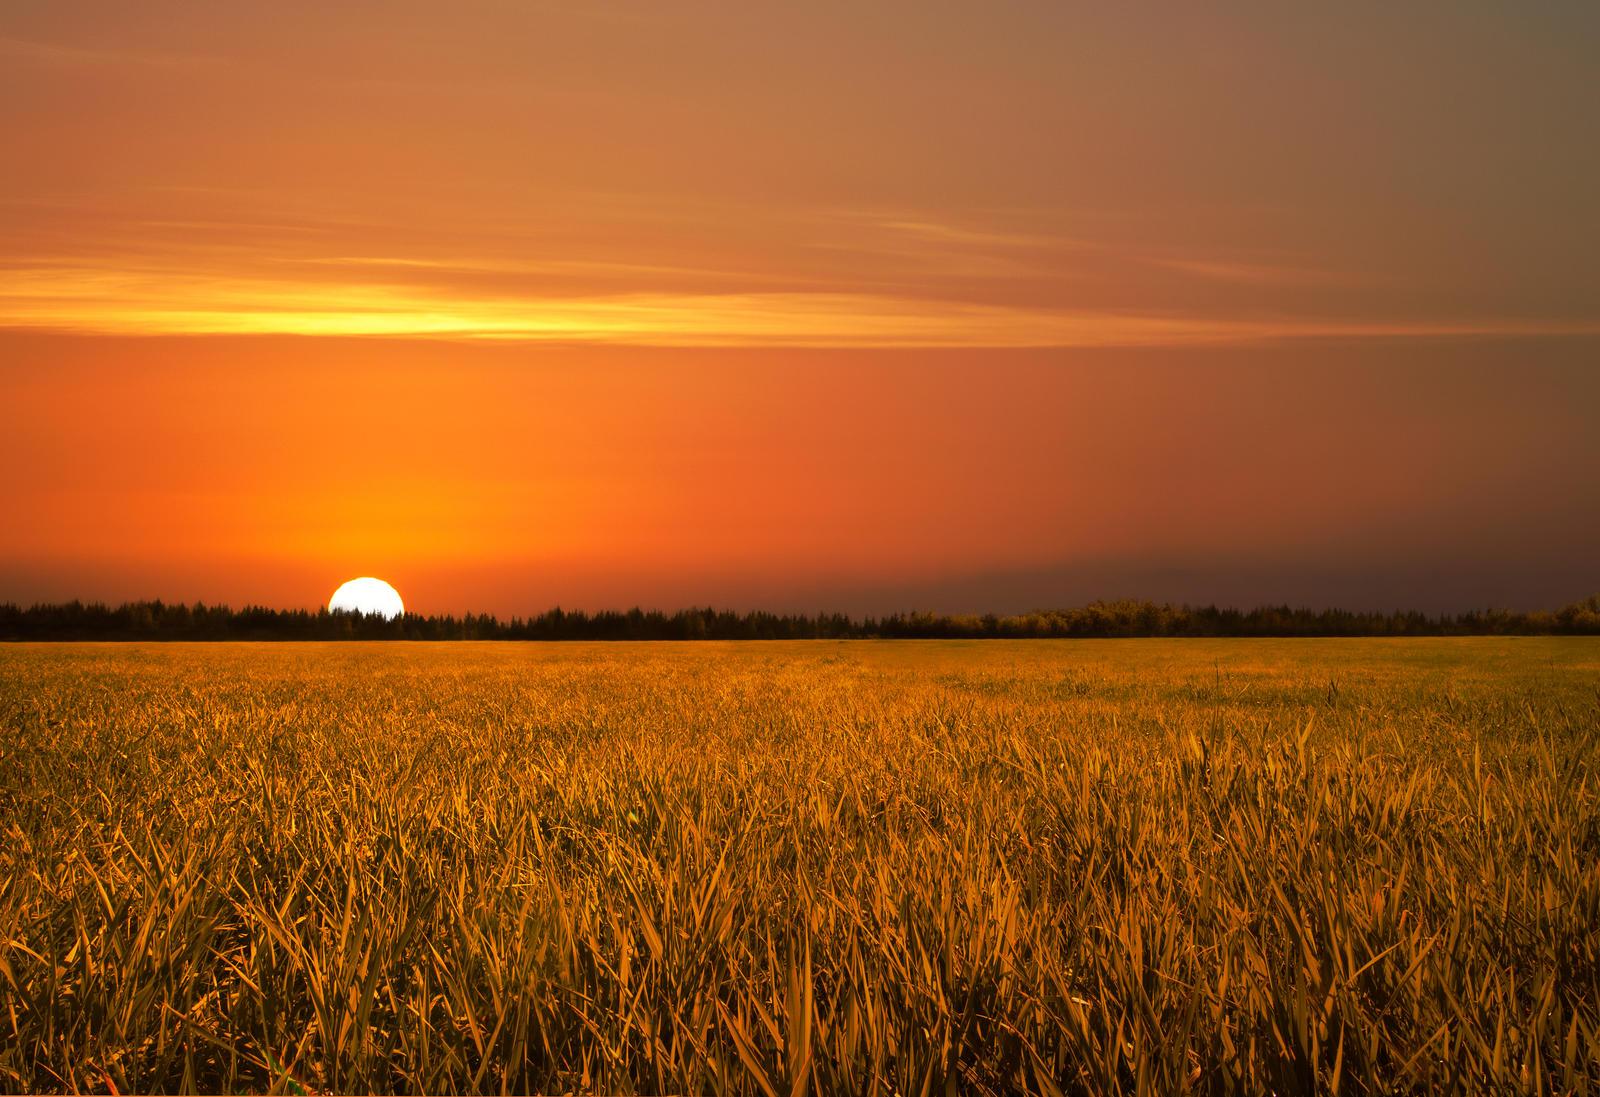 Golden Field Sunset Stock by leeorr-stock on DeviantArt